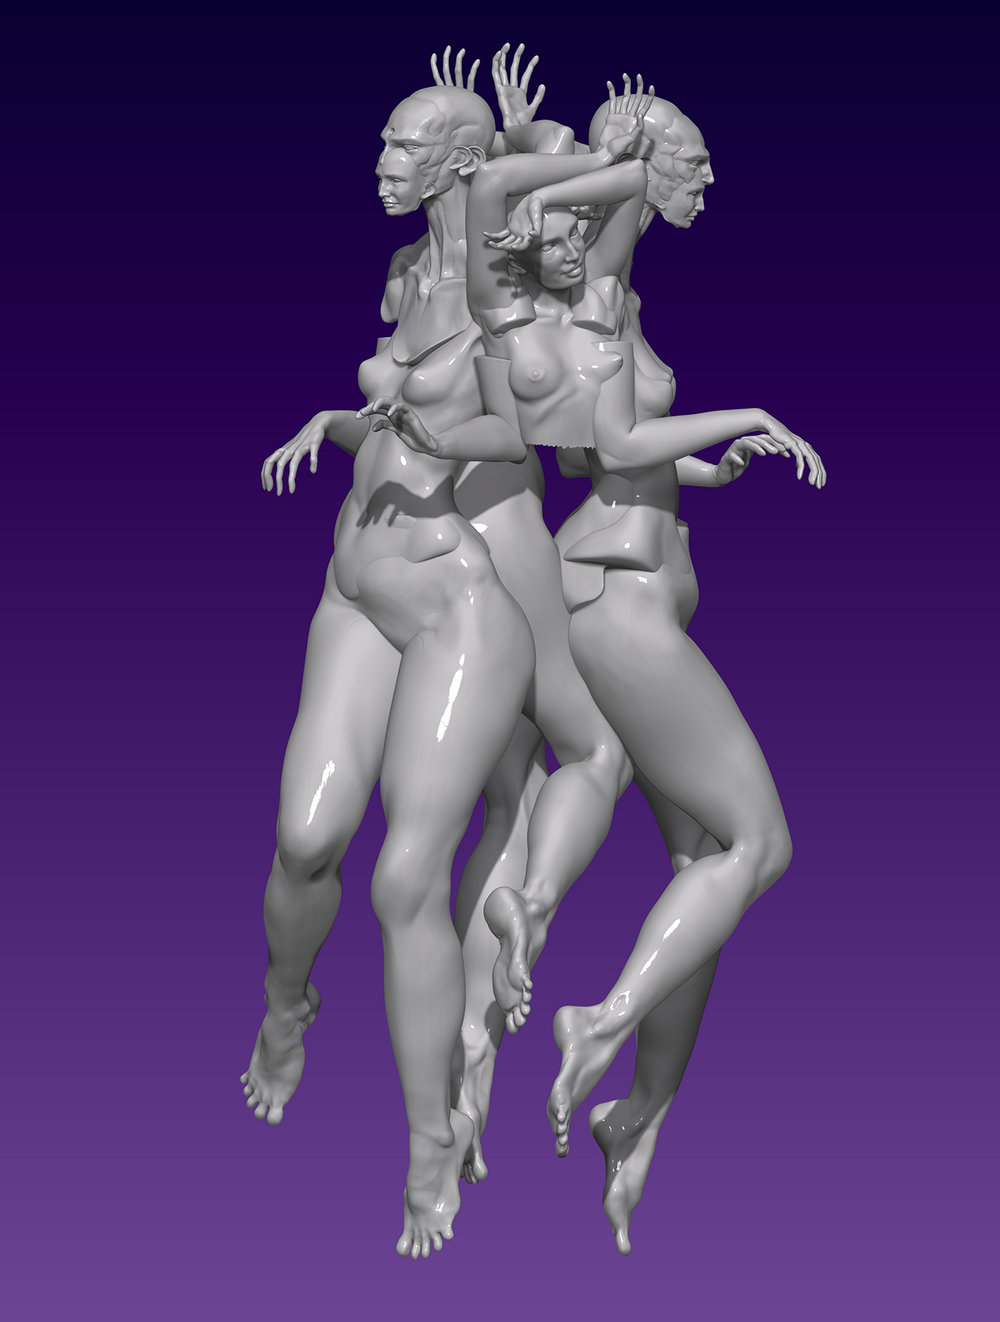 Max Brazier-Jones concept art zbrush figrative abstract surreal